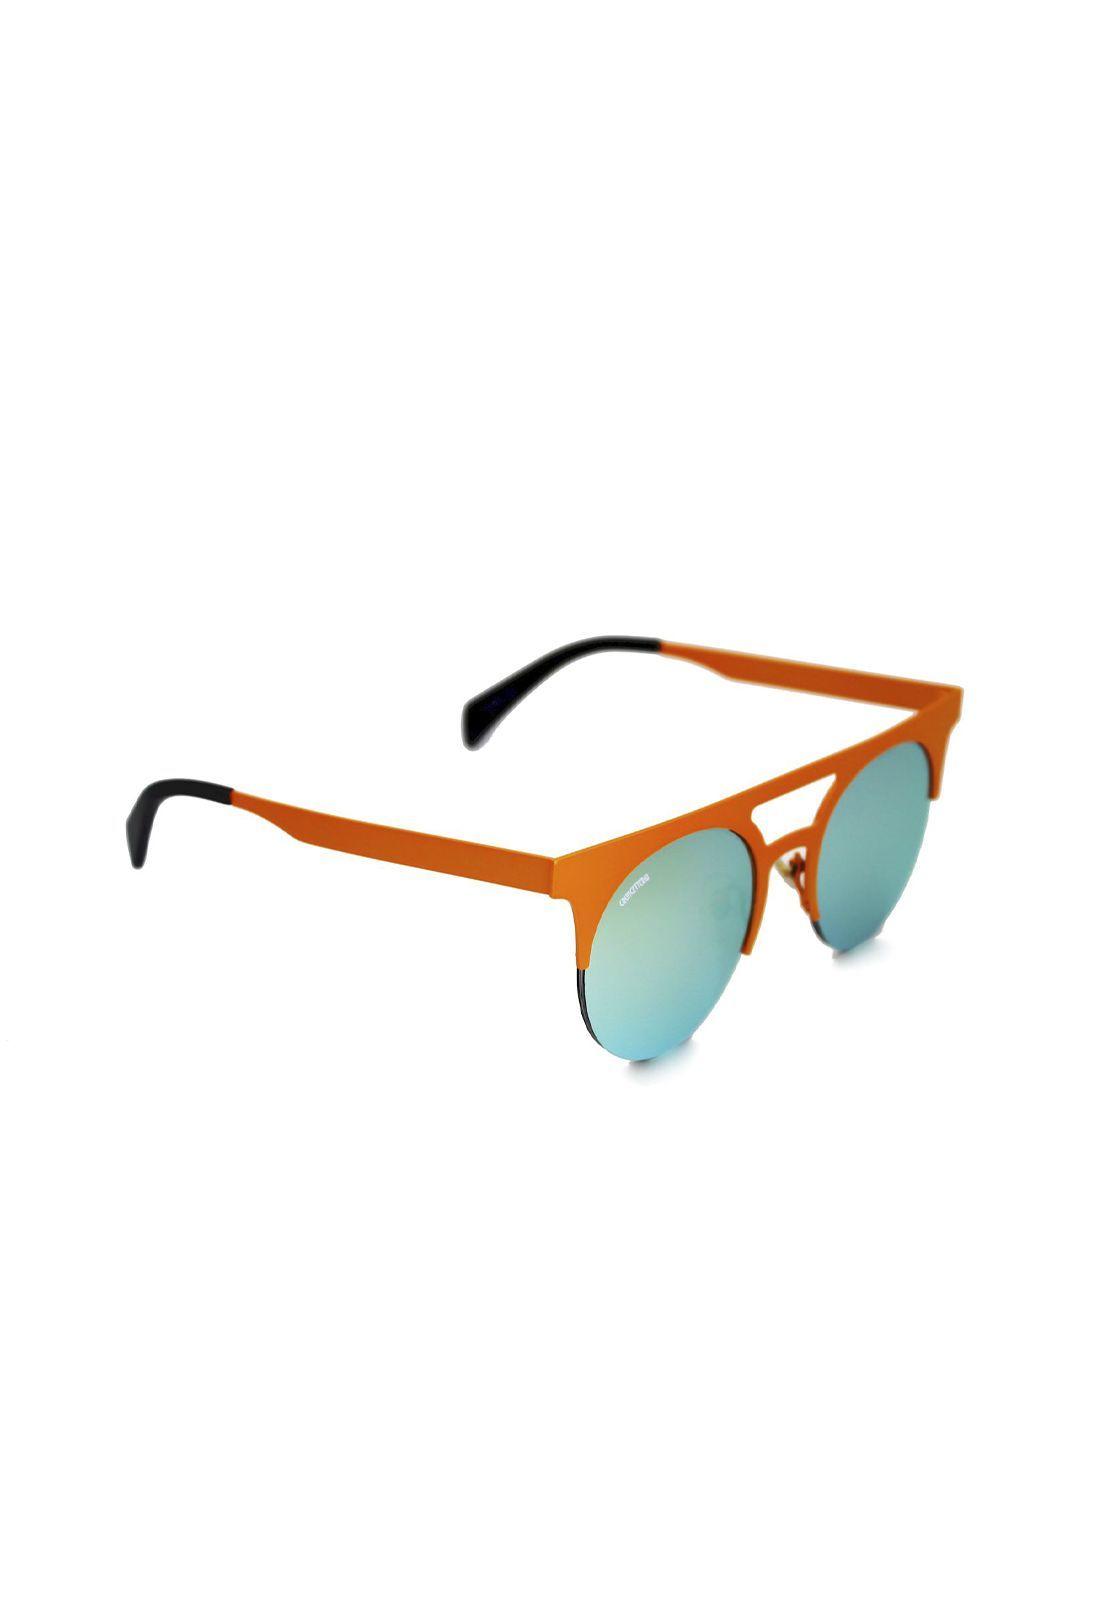 Óculos de Sol Grungetteria Laranja Mecânica